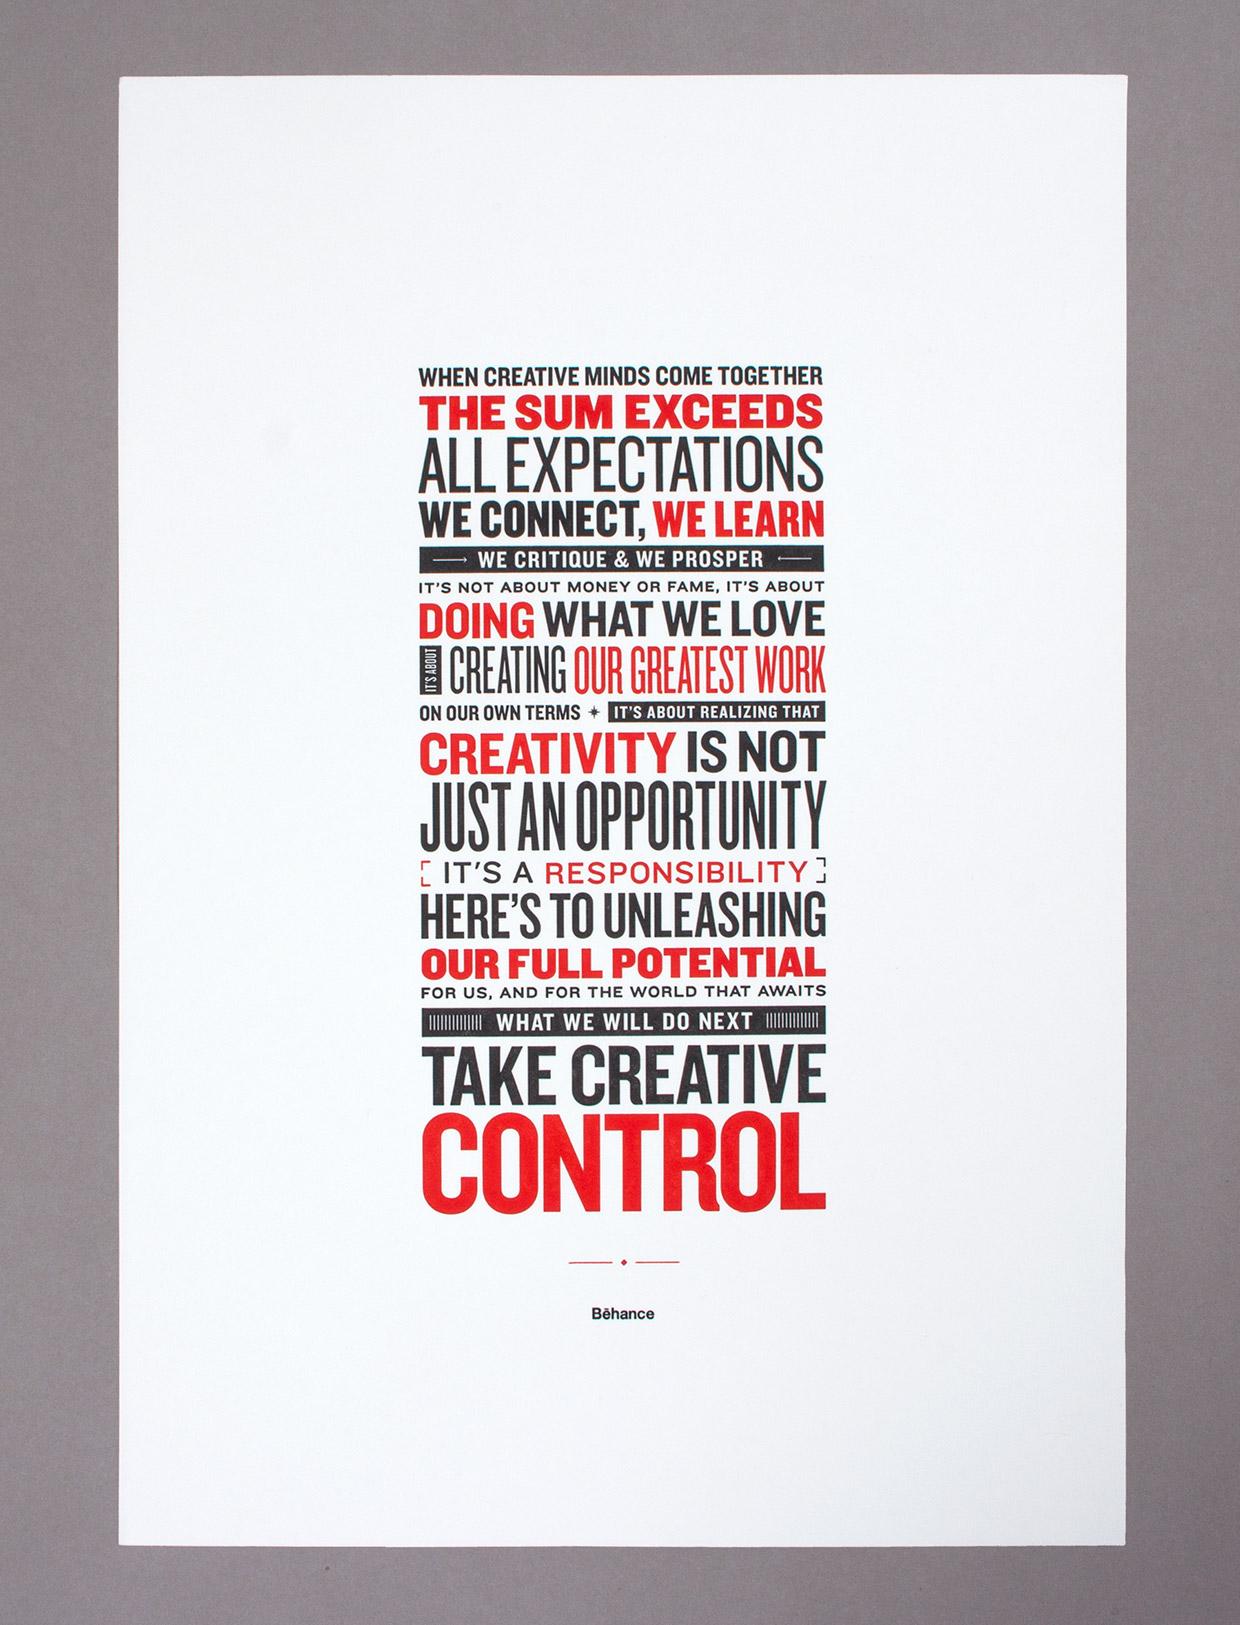 manifesto_lowres10.jpg